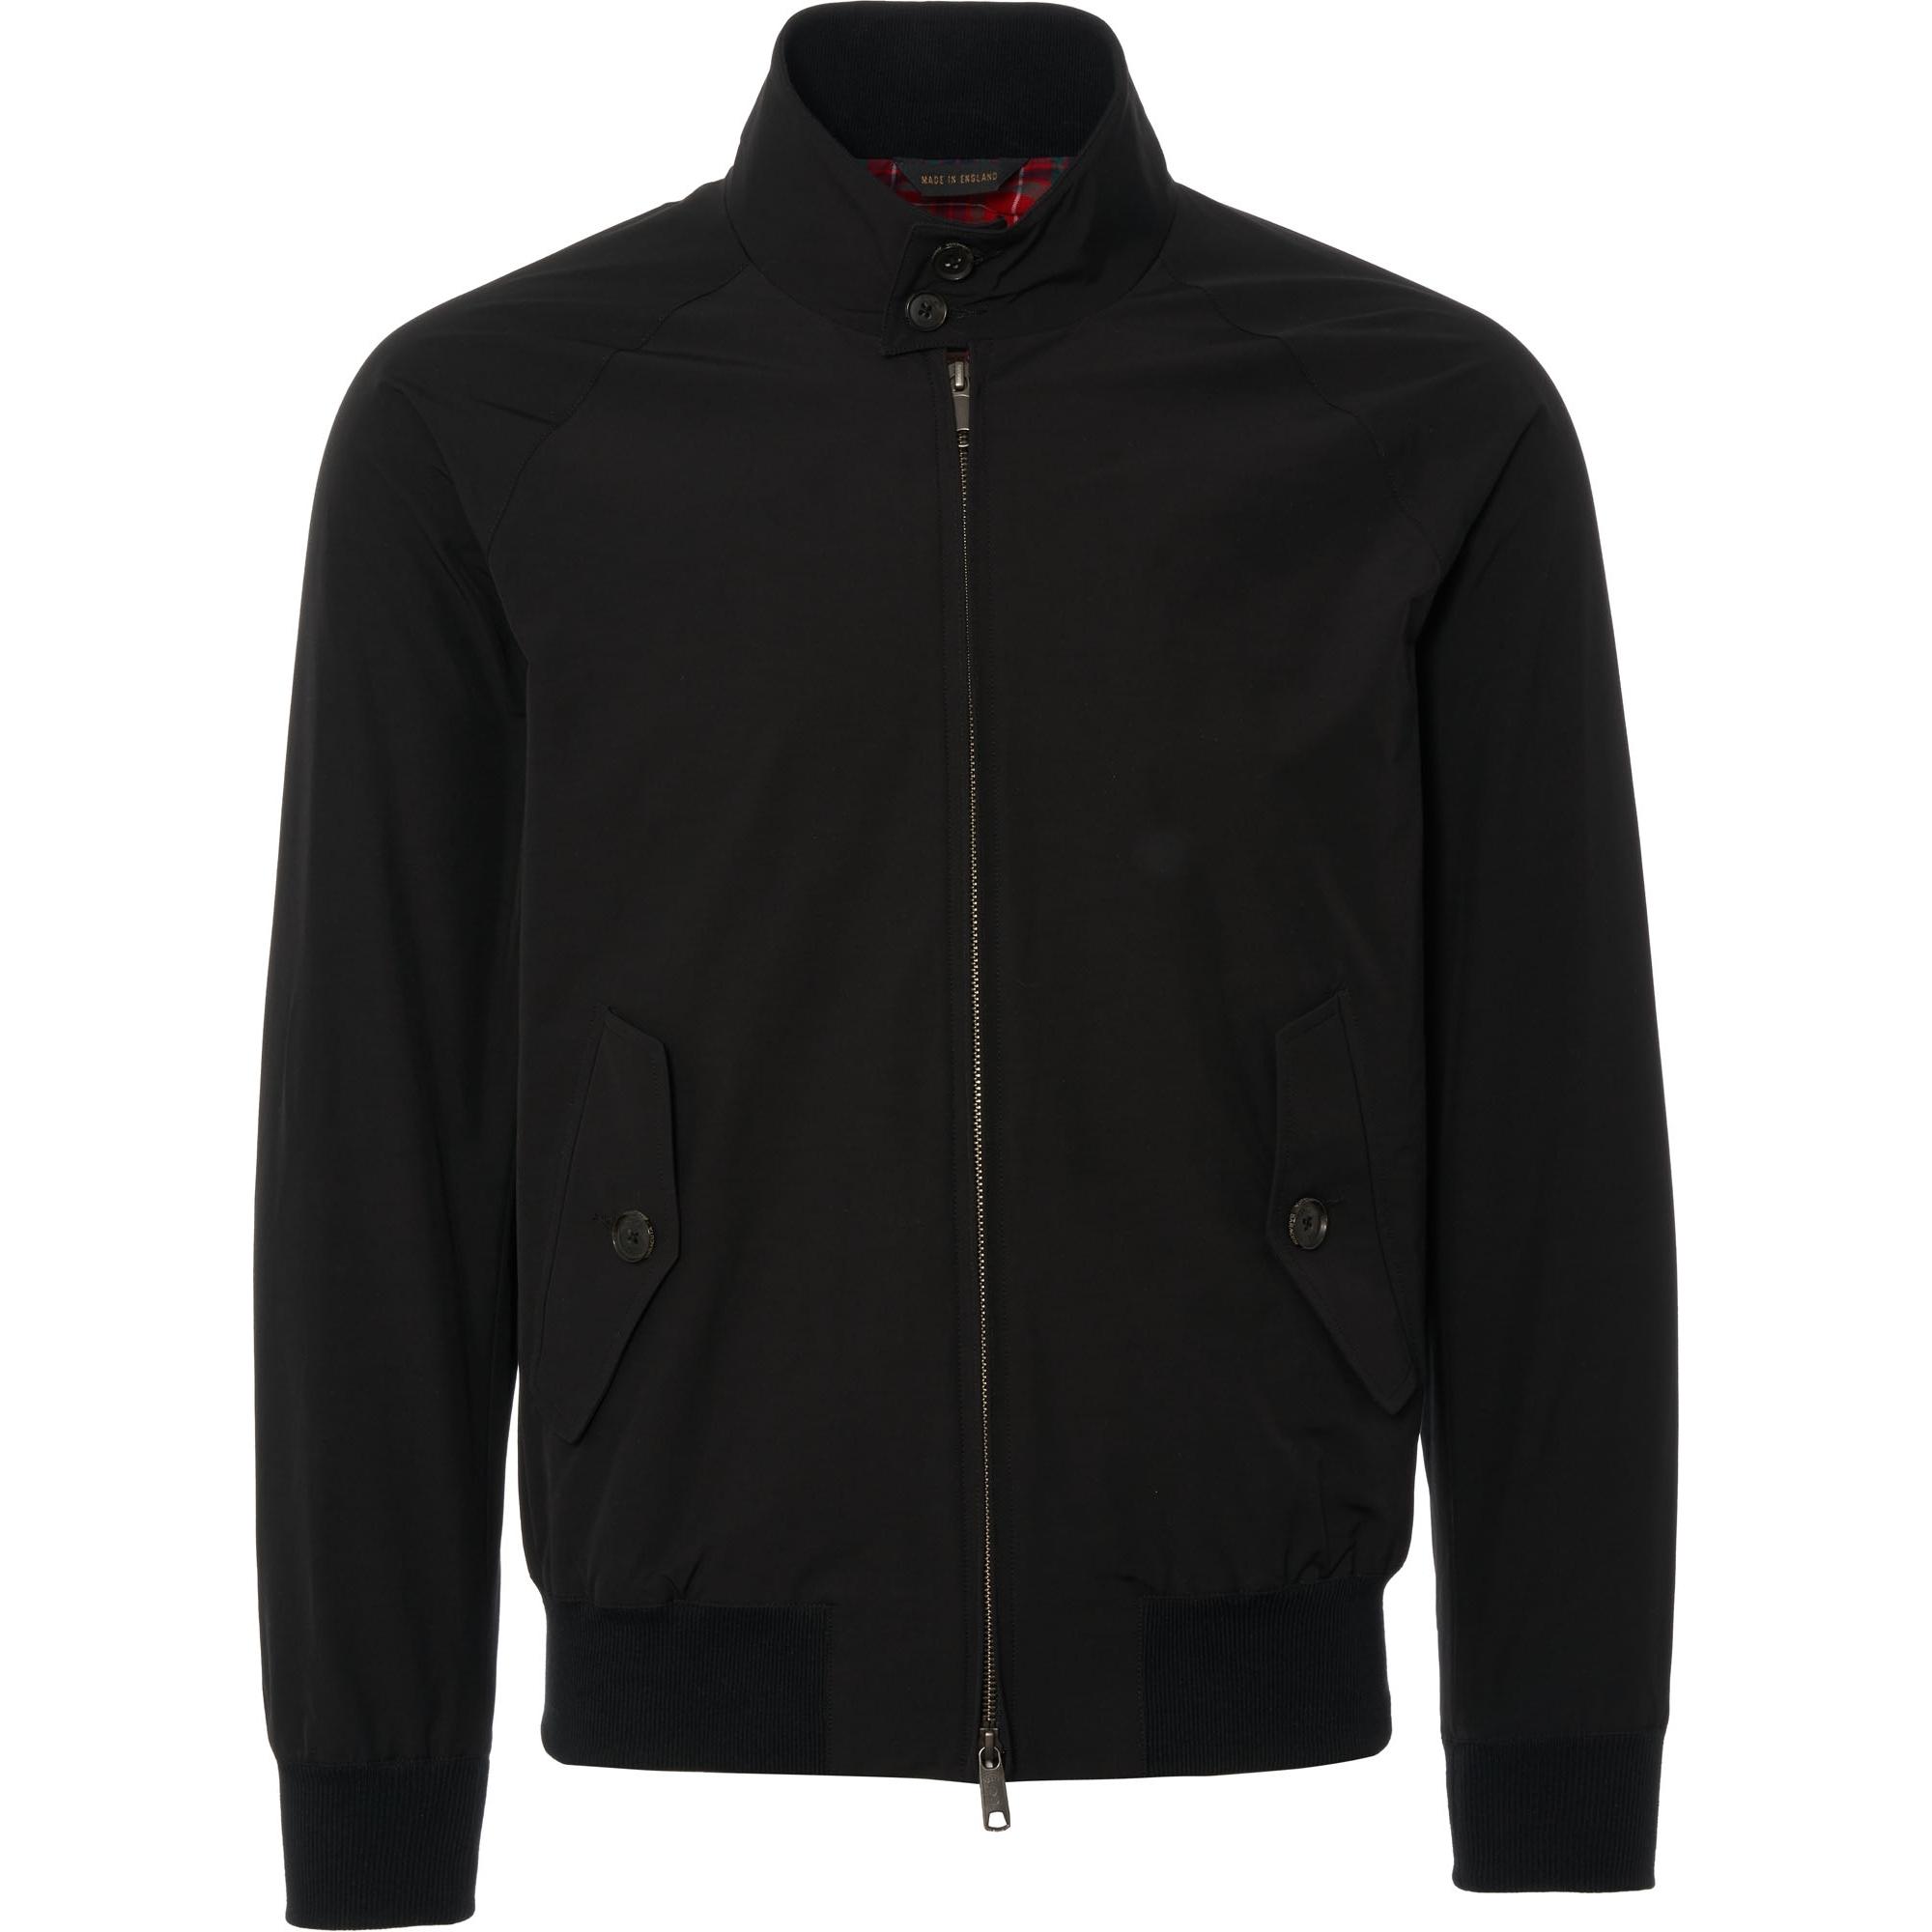 Baracuta G9 Black Harrington Jacket BRCPS0001 c49291f93c